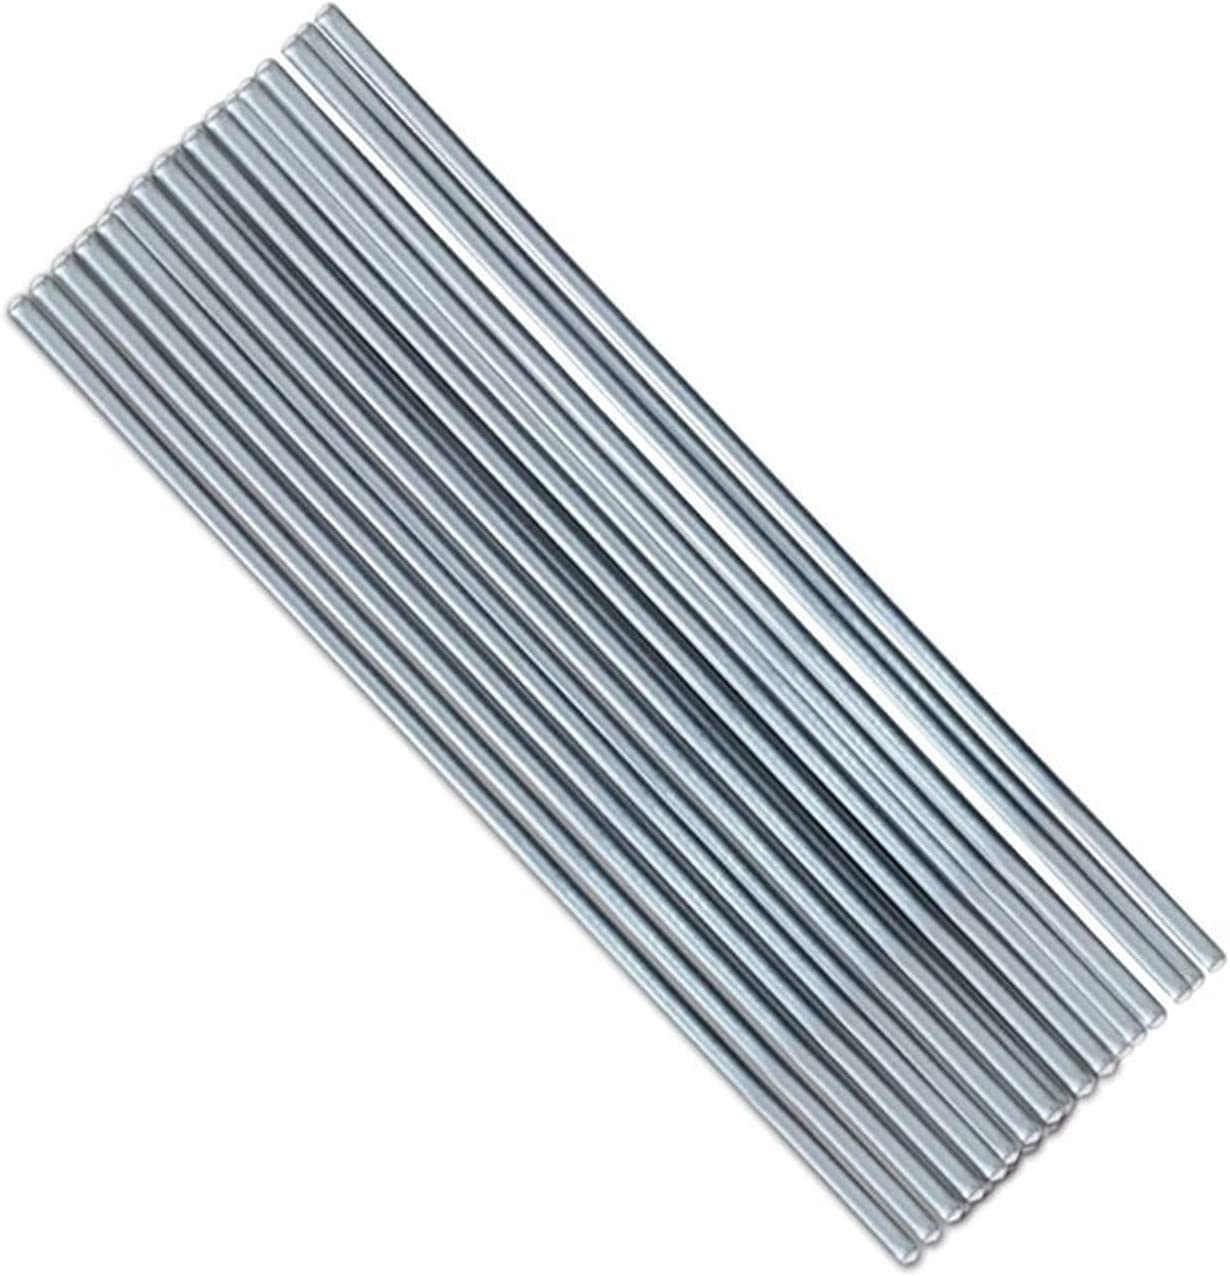 caihv-Welding Rod 2mm 1.6mm free Metal Magnesium Spring new work Ele Silver Aluminum